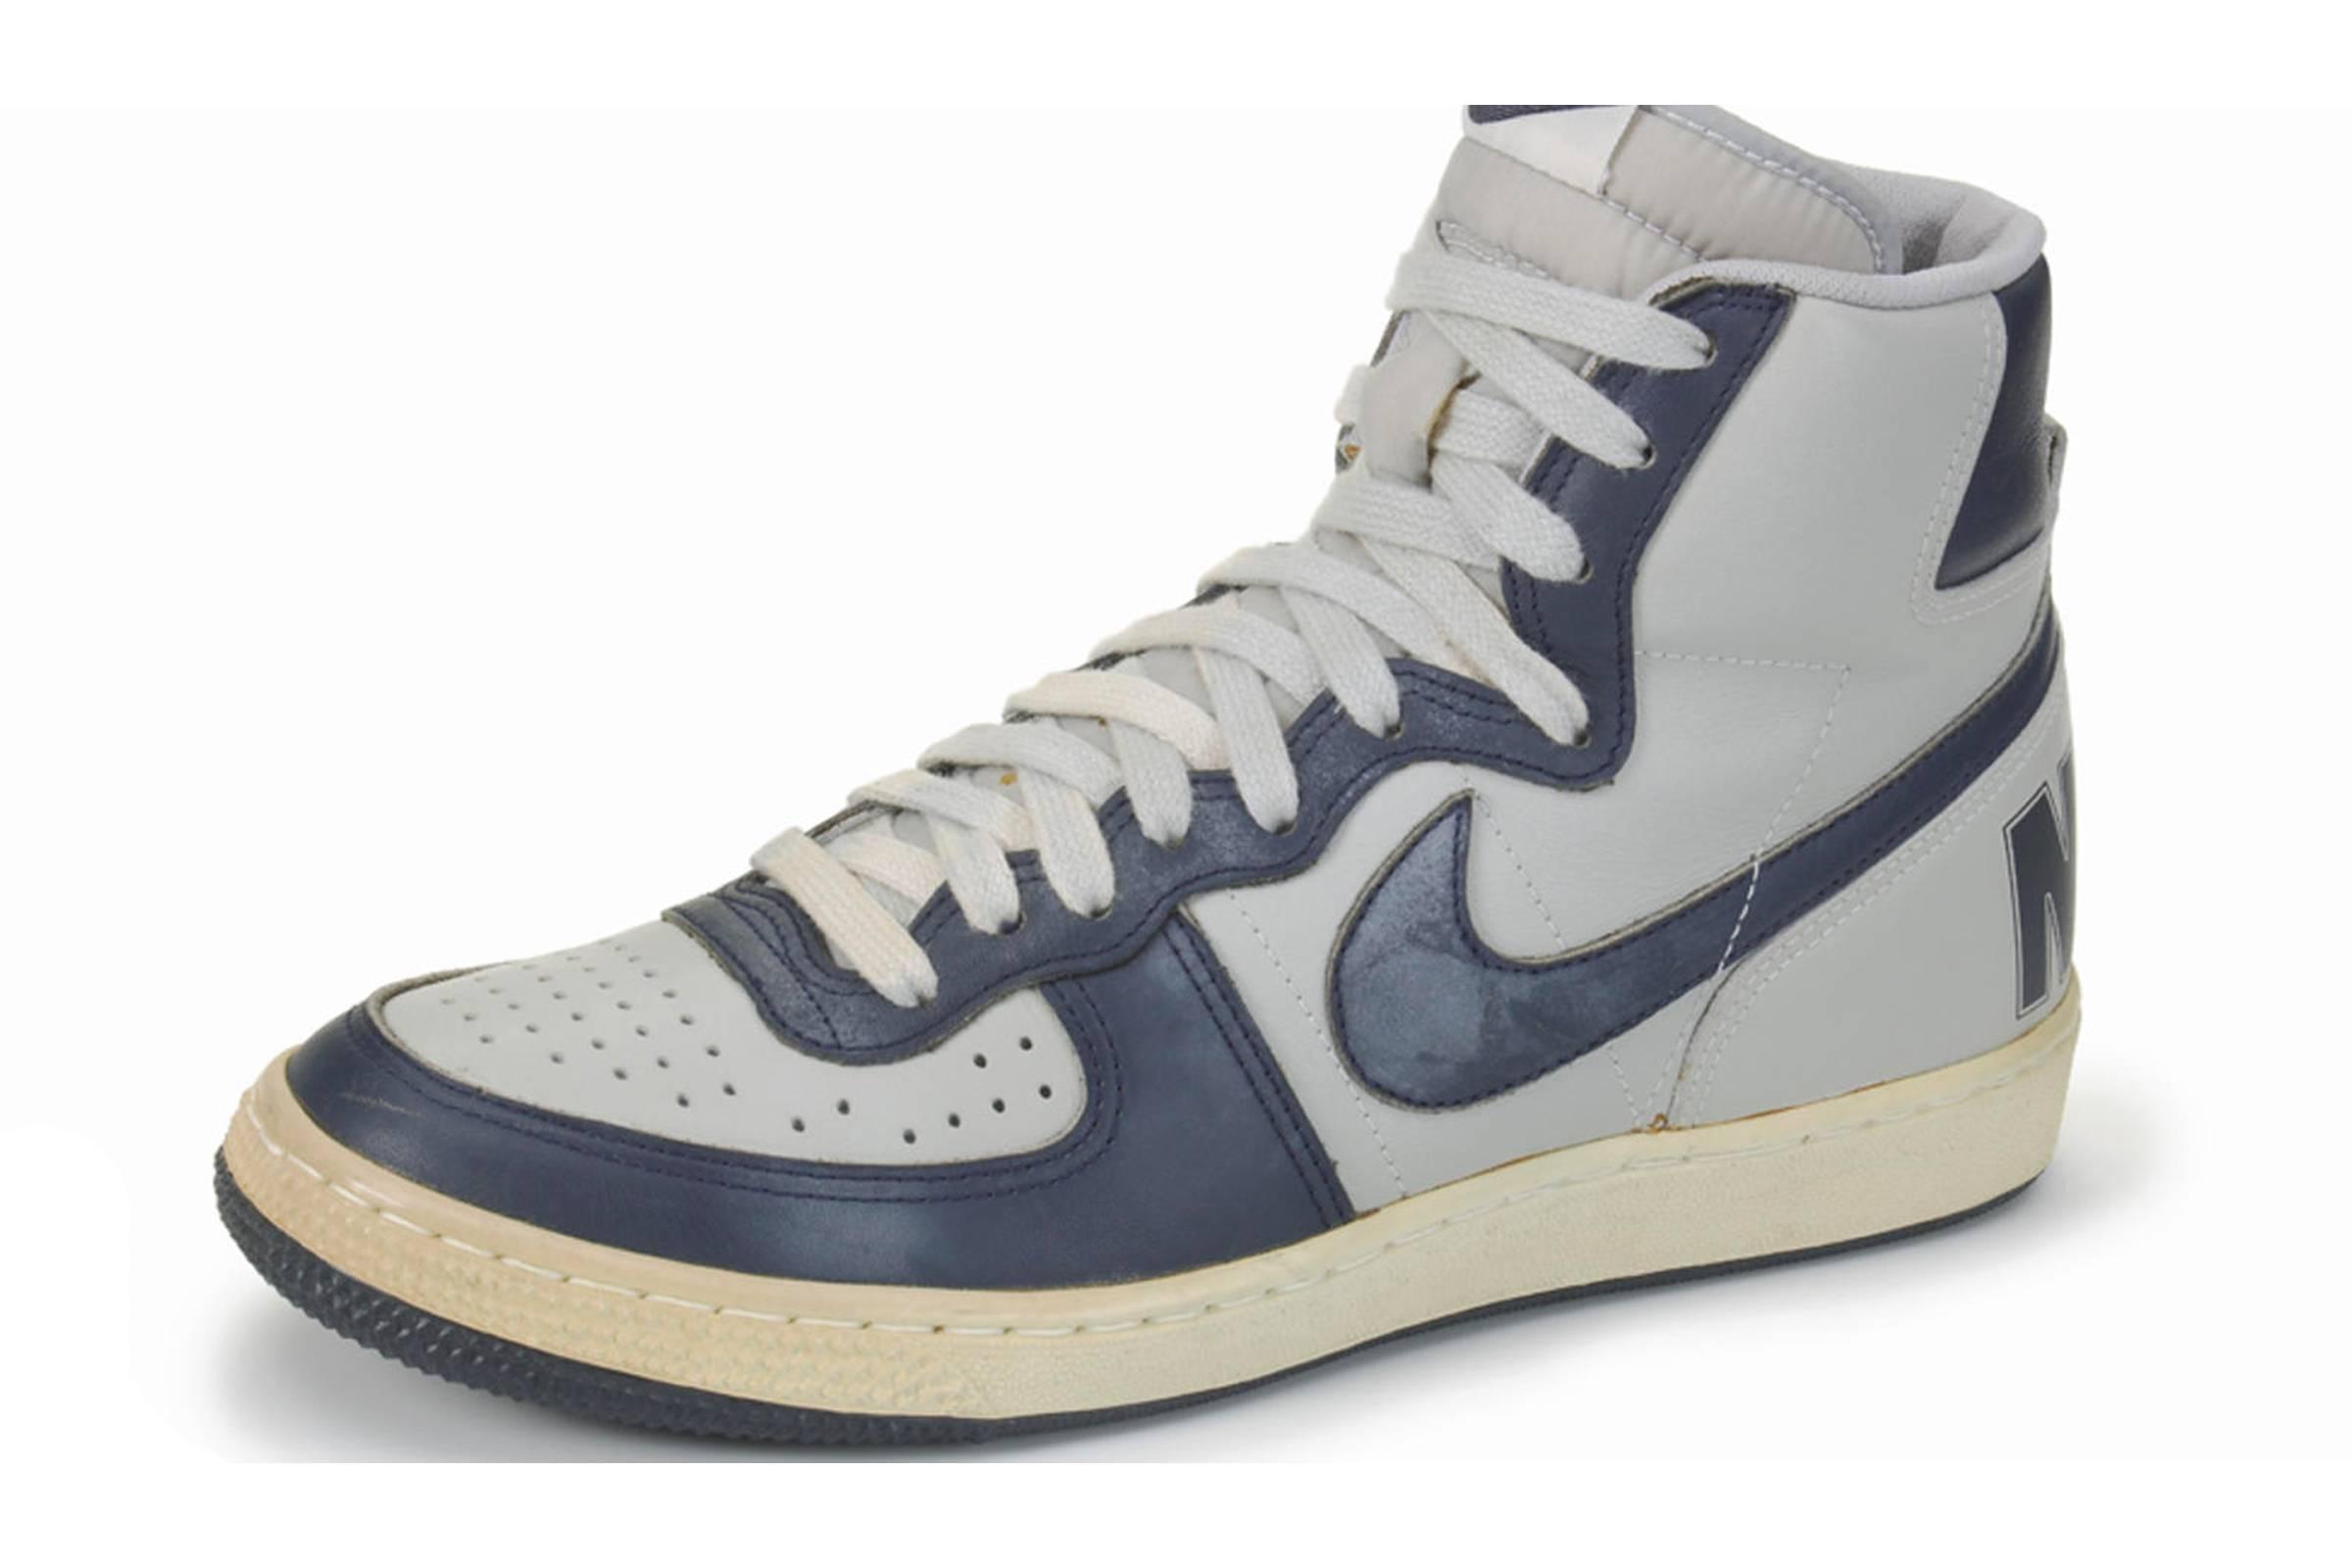 Nike Terminator (1985)